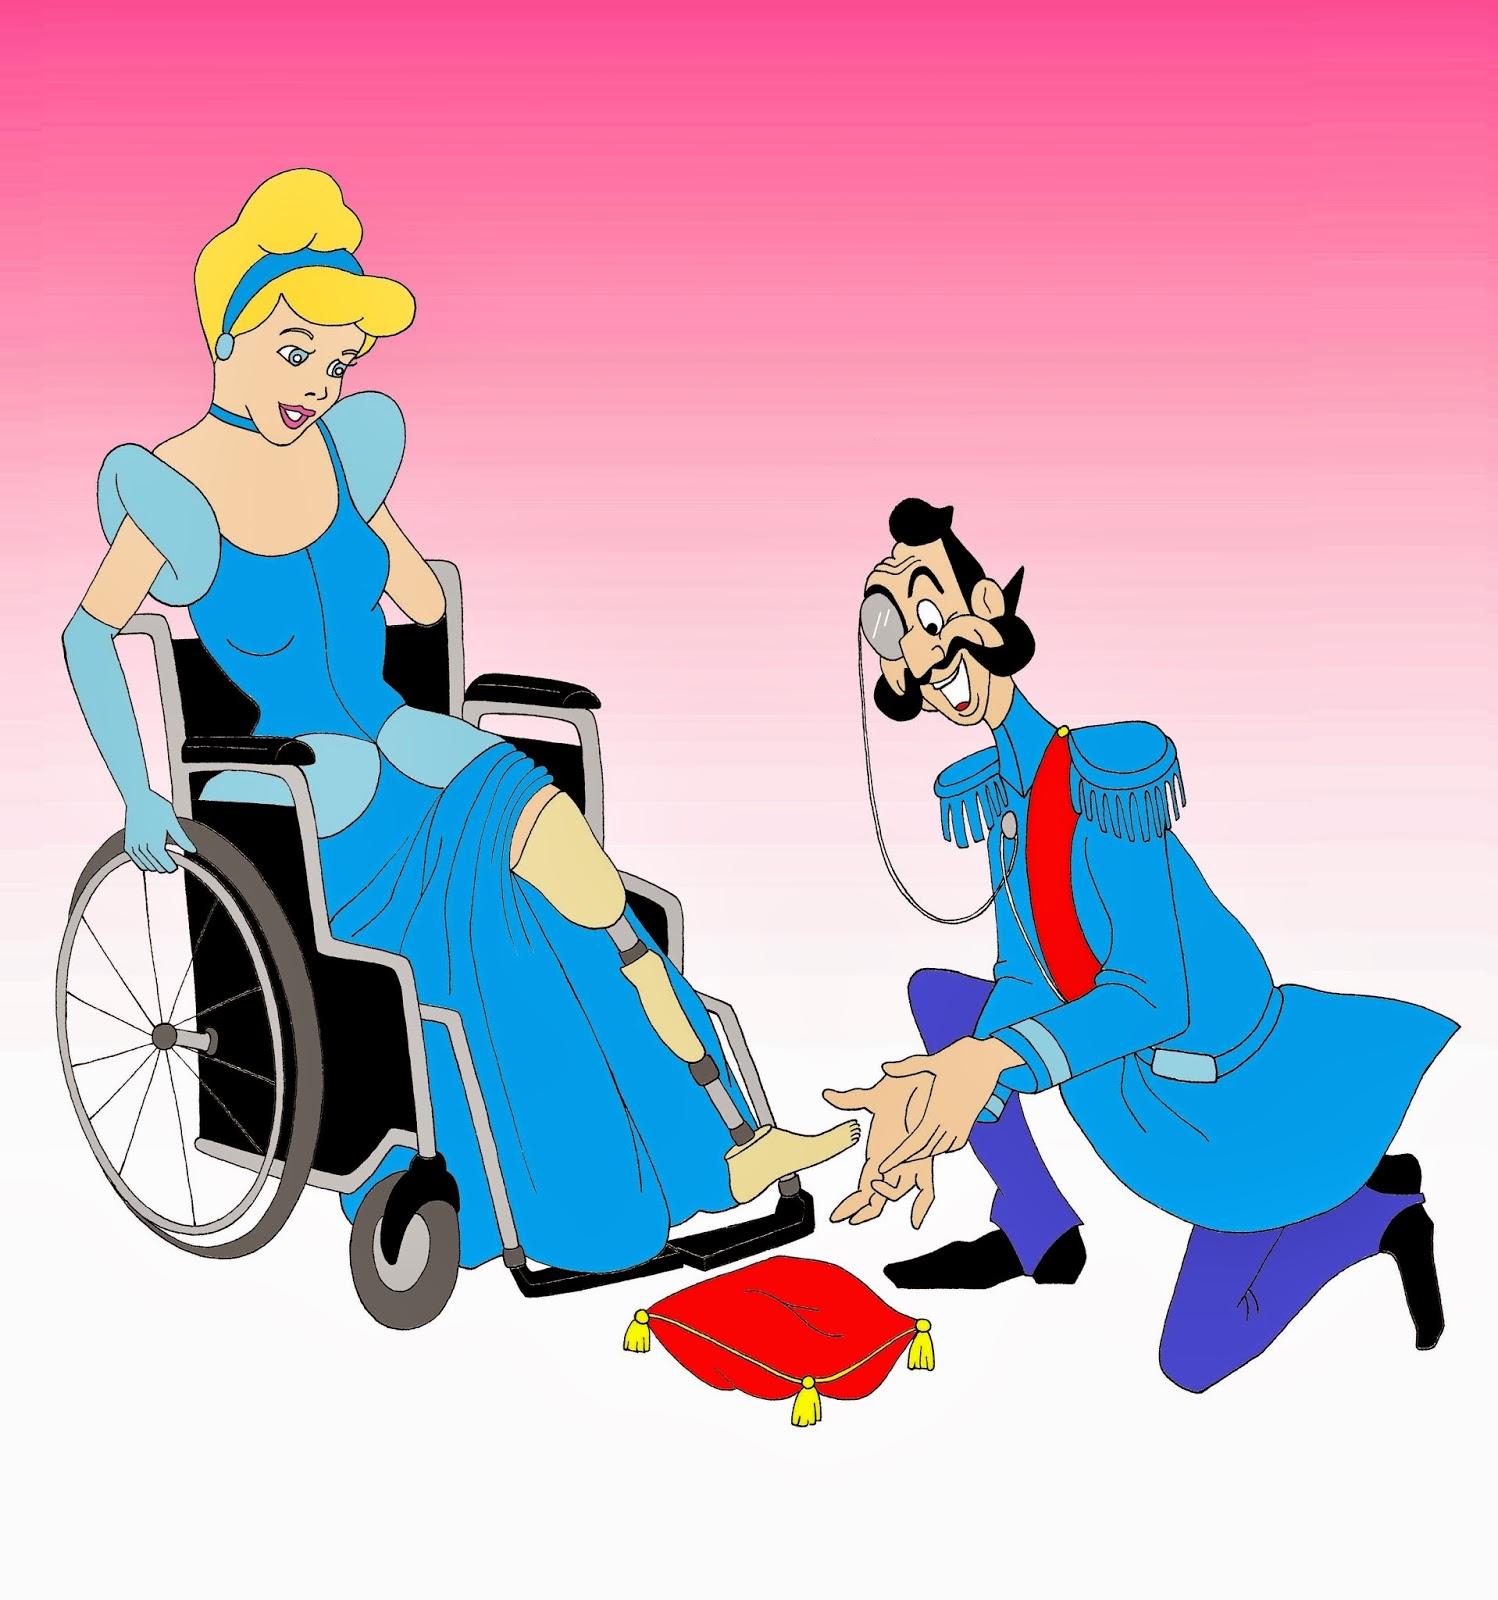 Disney: Humor Chic: Humor Chic Equal Rights